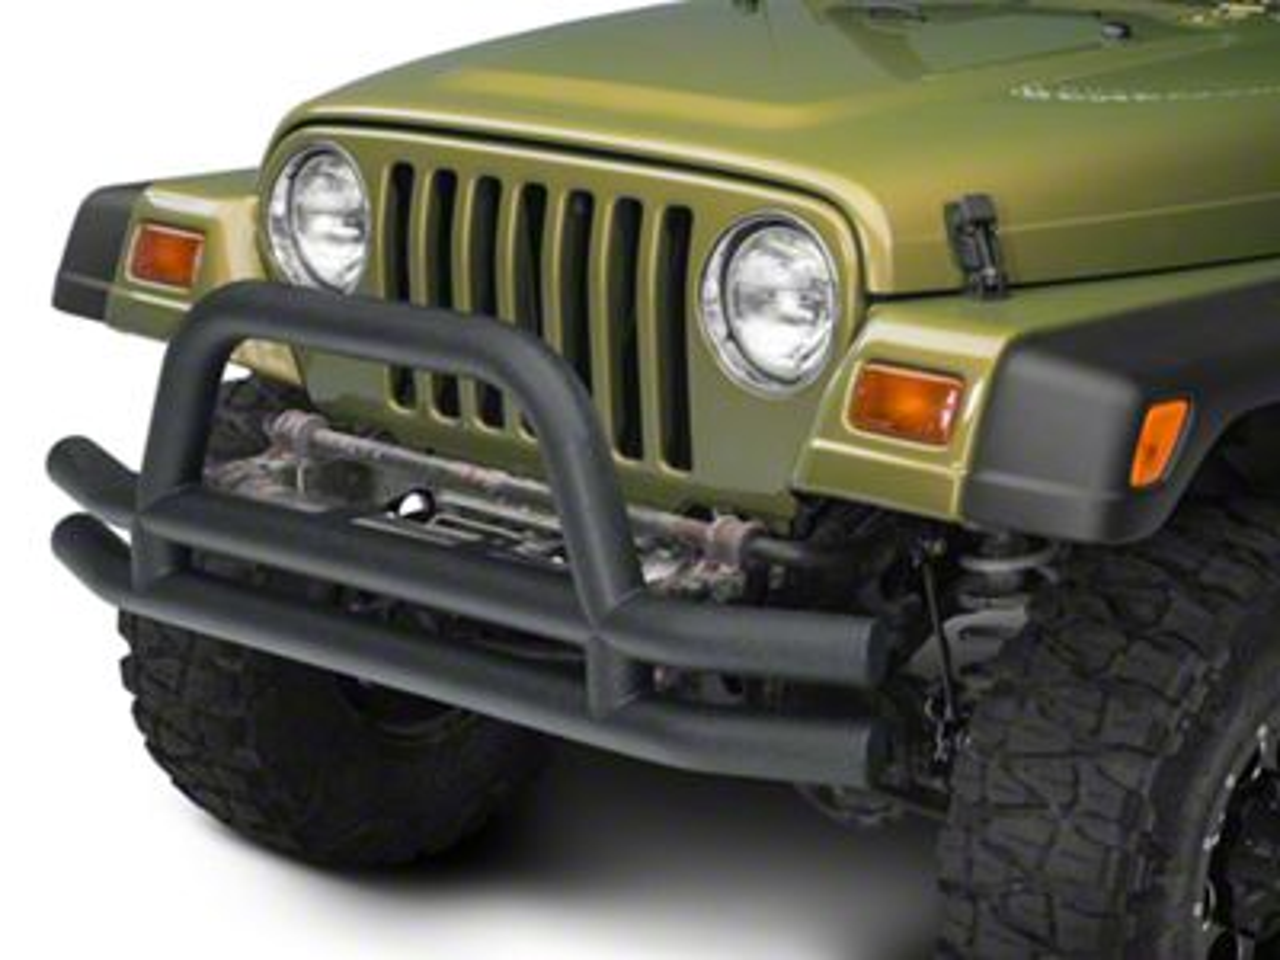 Add Barricade Double Tubular Front Bumper w/ Hoop Over-Rider - Textured Black (87-06 Wrangler YJ & TJ)